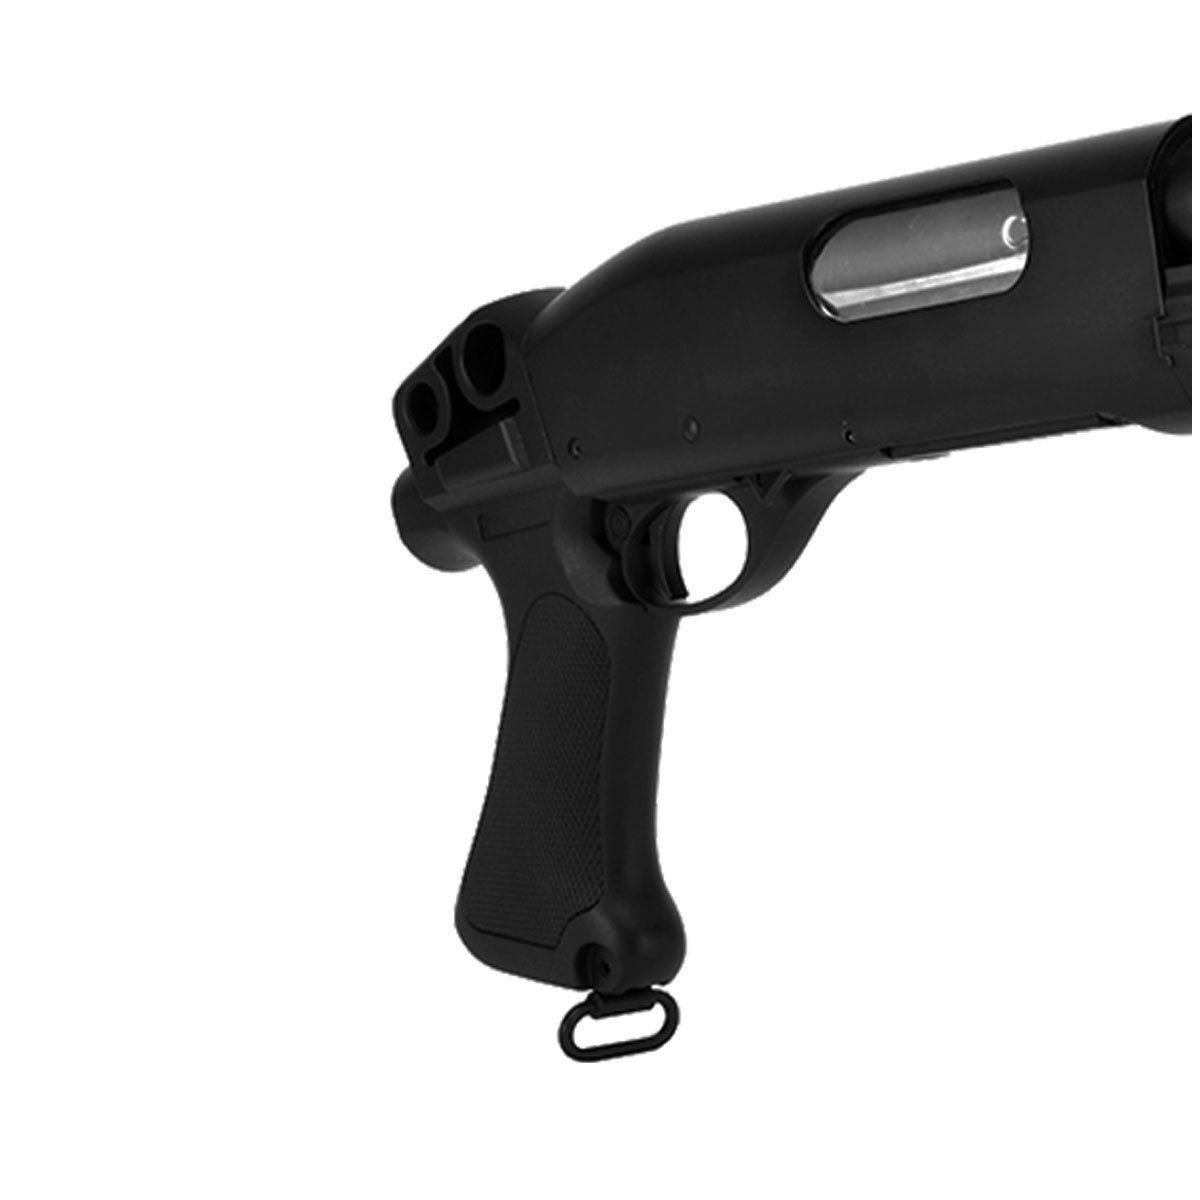 Shotgun Airsoft CYMA M870 CM351 Spring 6mm + BB King 0,12g